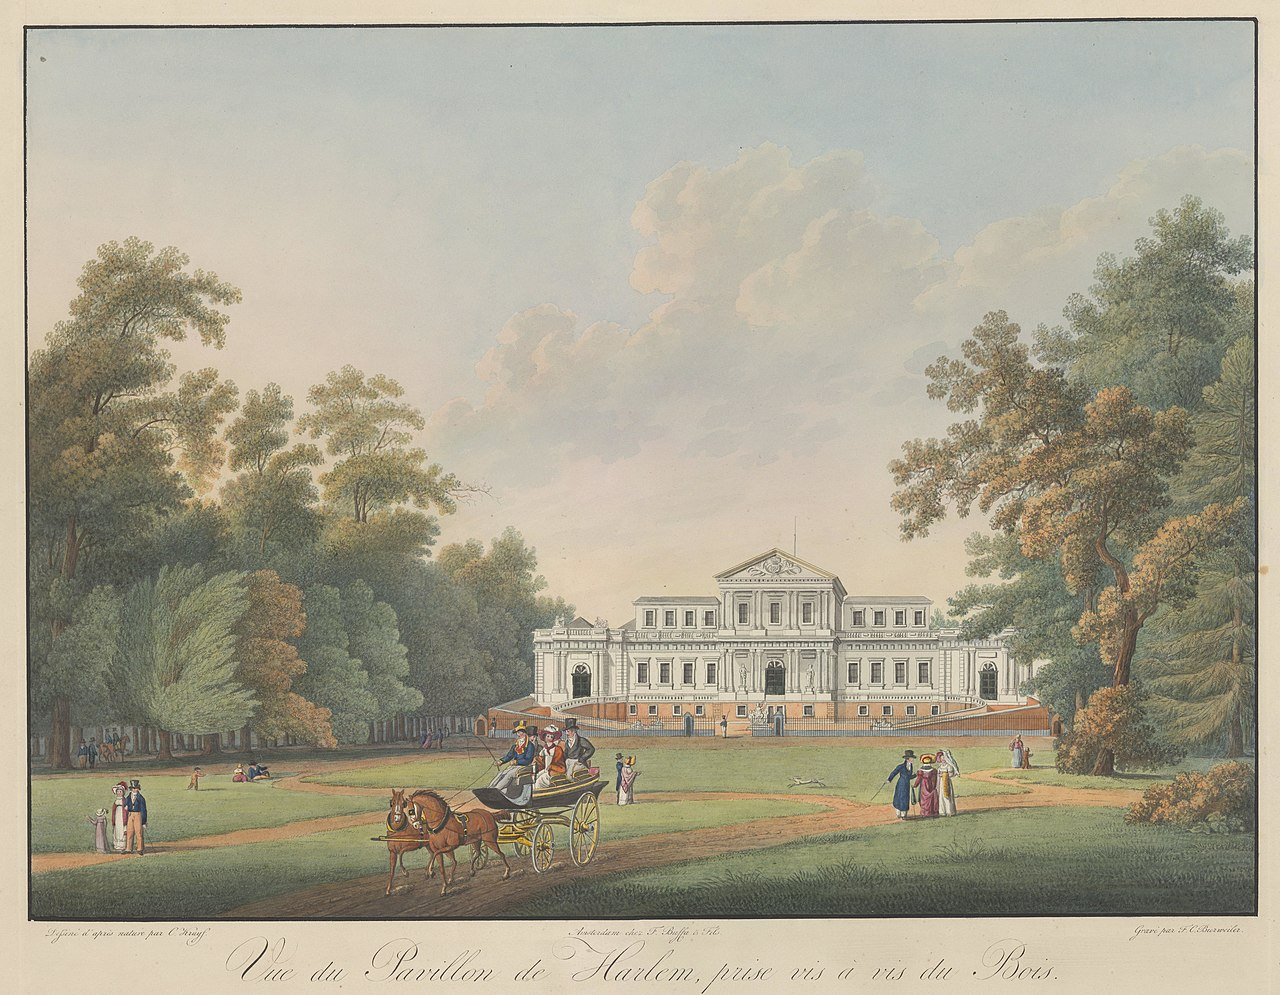 file vue du pavillon de harlem prise vis a vis de bois frederik christiaan bierweiler 1815. Black Bedroom Furniture Sets. Home Design Ideas